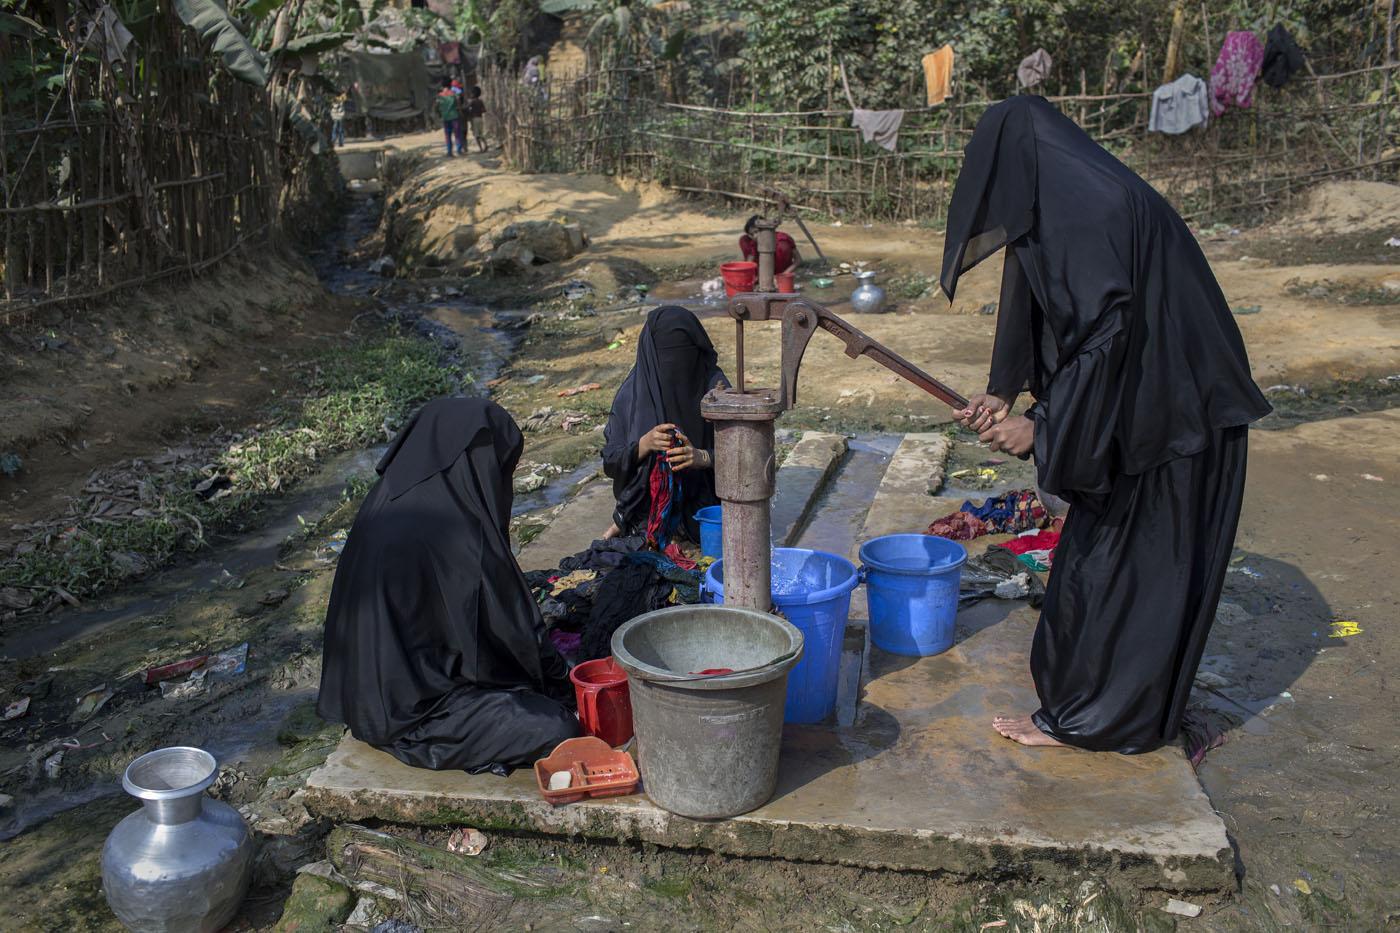 Probal Rashid_Bangladesh_The Rohingyas-A People Without A Home_12.jpg